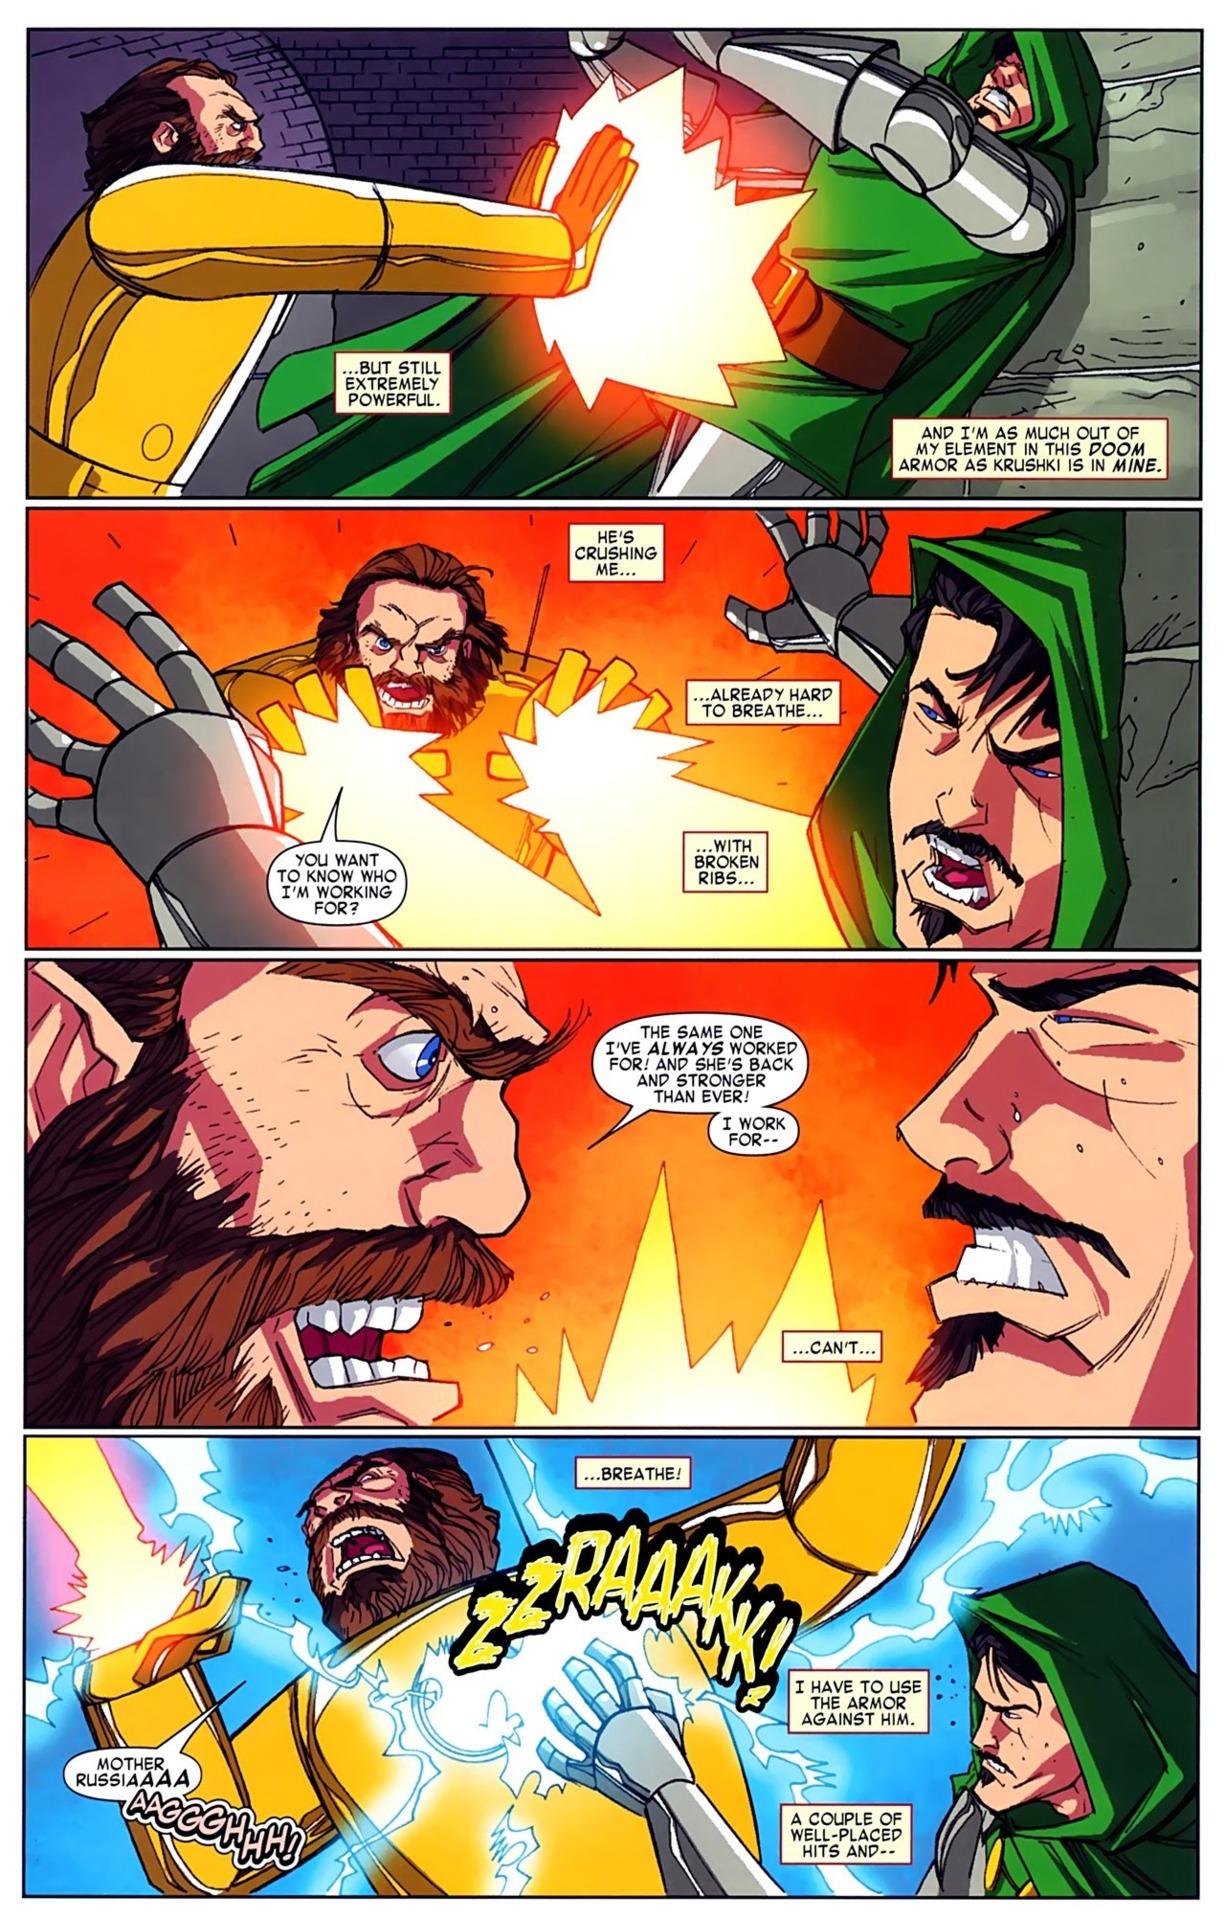 Iron Man & the Armor Wars #2